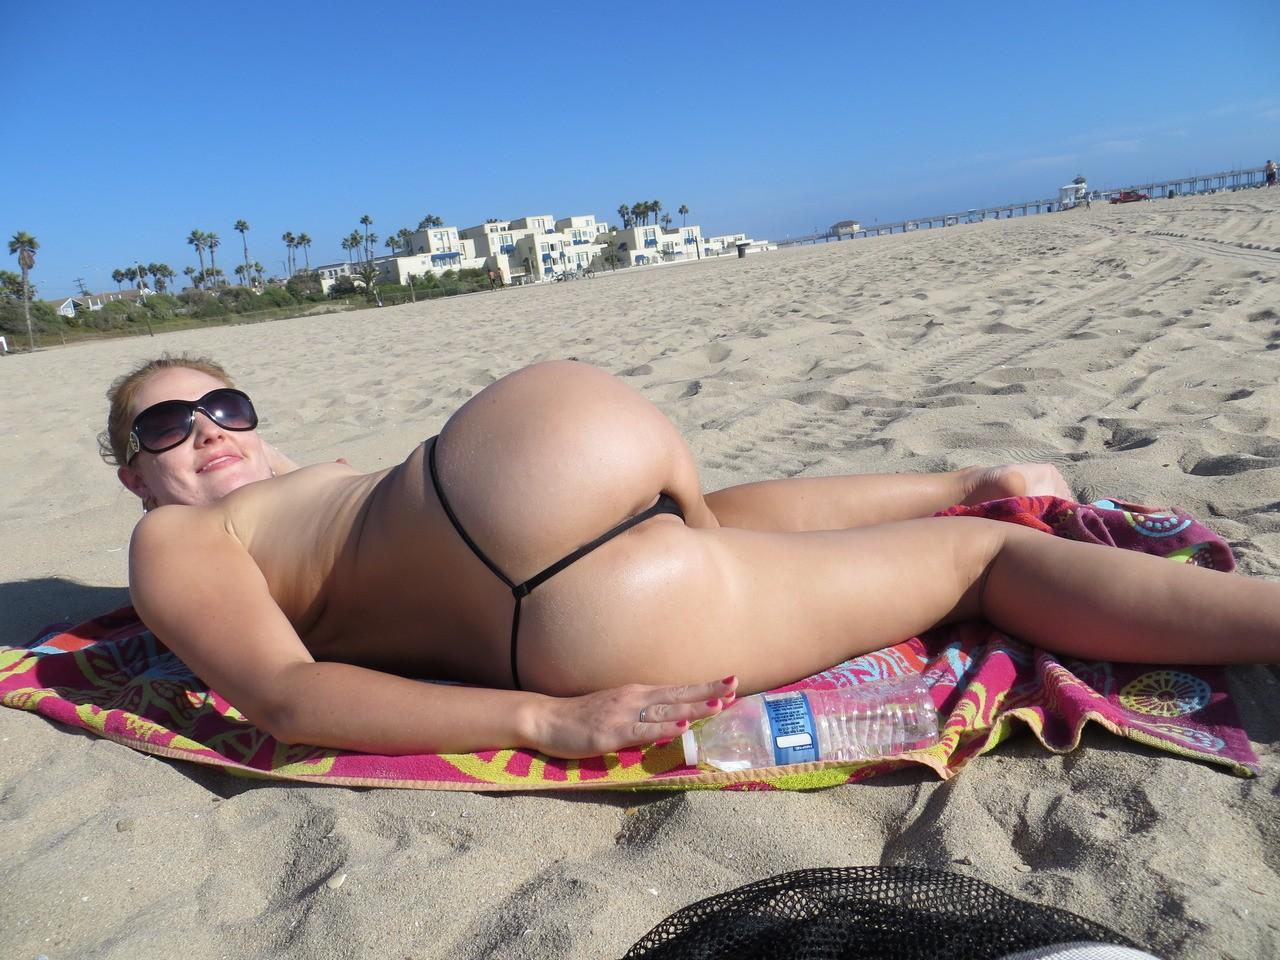 sex med eldre kvinner sex forum Beach, Bigsmile, Bikini, Curvy, Gabbiehanna, Milf, Pawg, Piercednose, Readyforcum, Tongueout